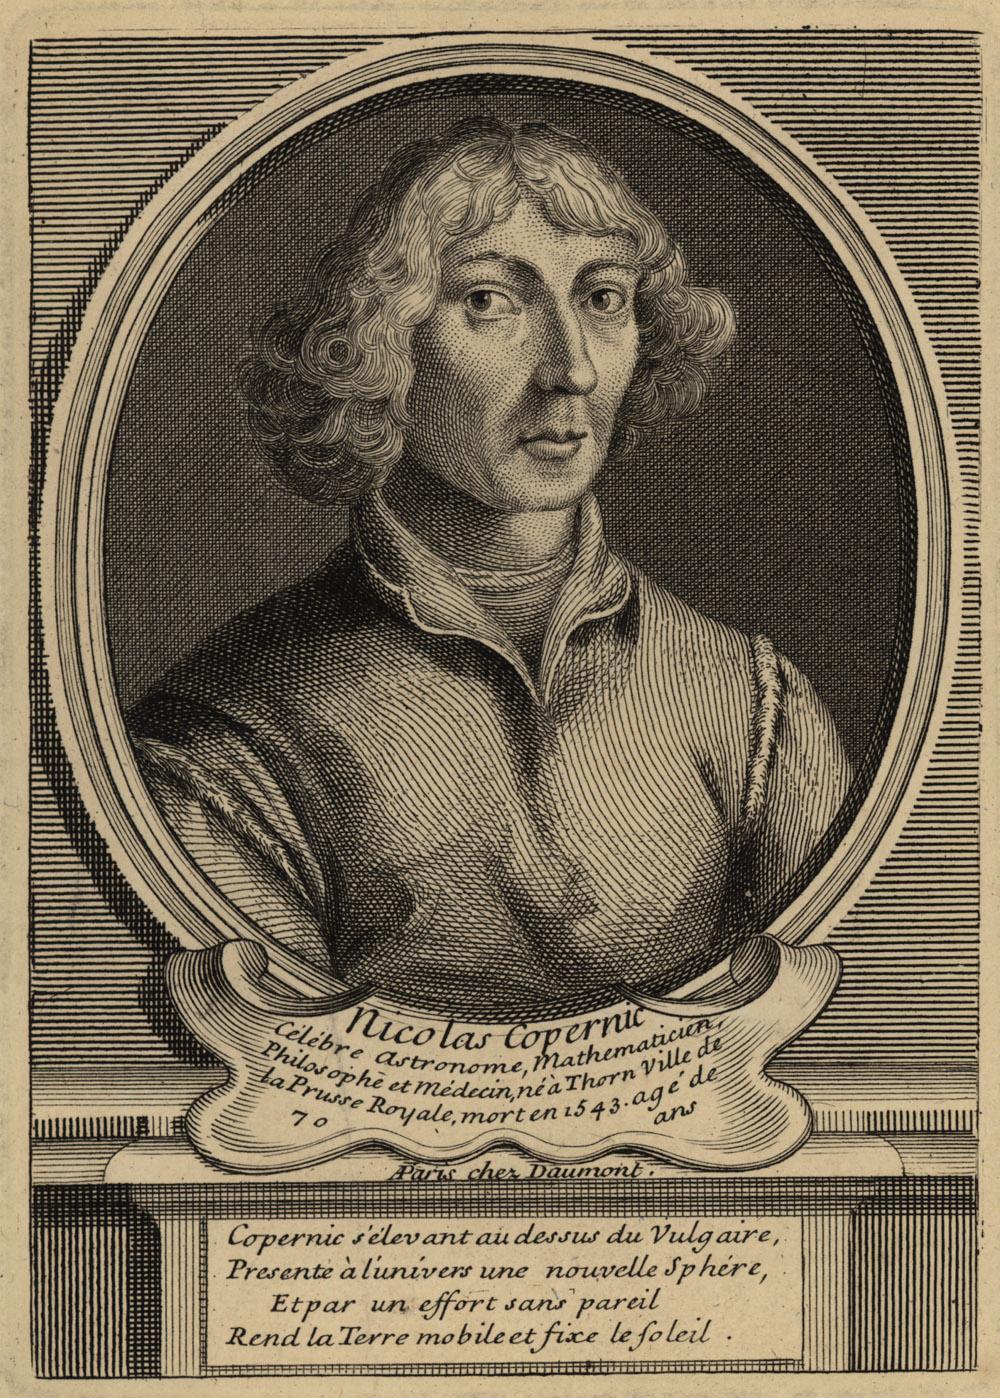 Portrait of Nicolaus Copernicus,  Image number:SIL14-C5-12a